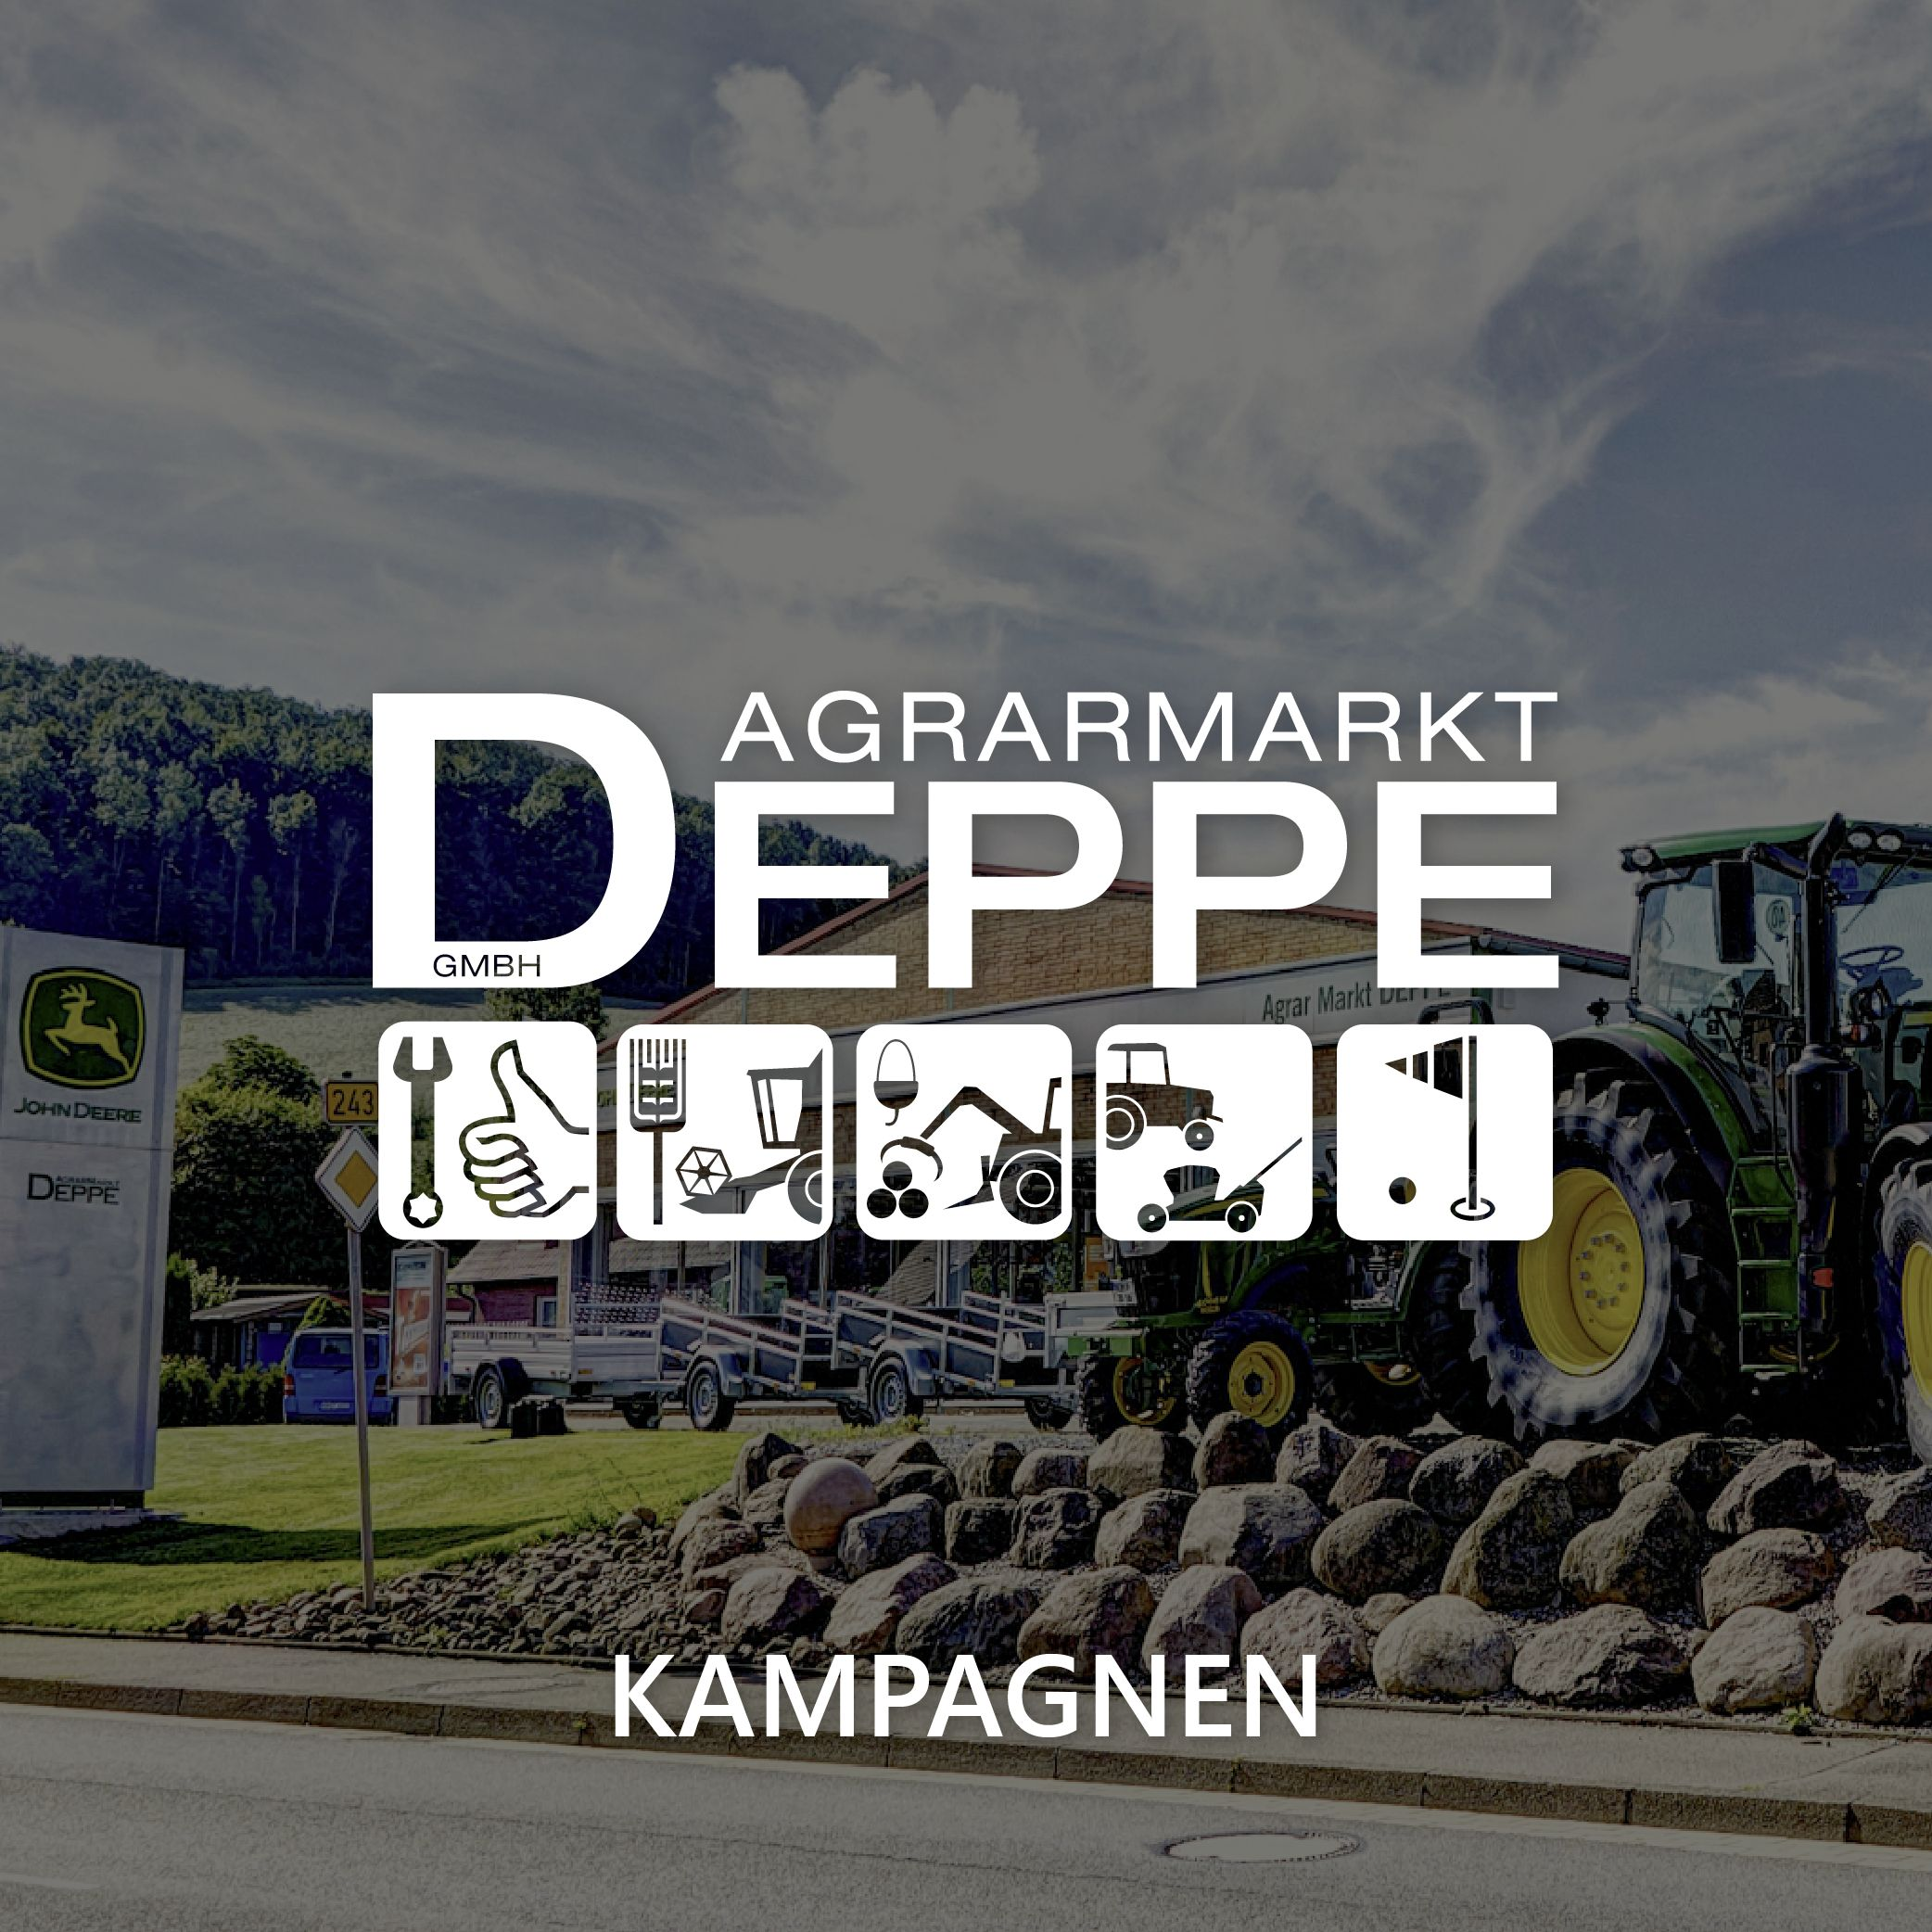 Agrarmarkt Deppe Kampagnen